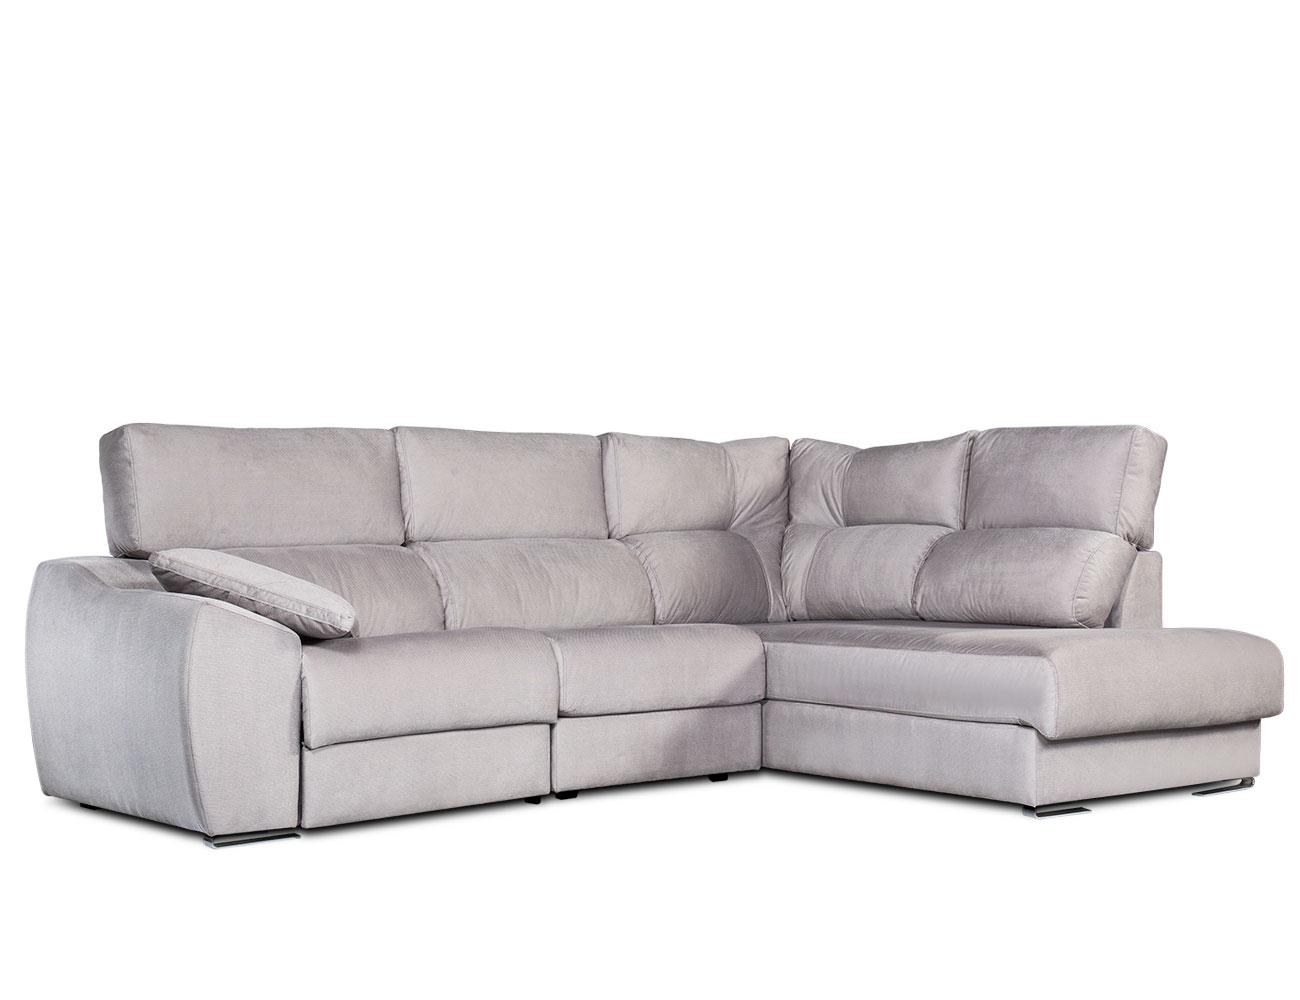 Sofa chaiselongue rincon electrico1